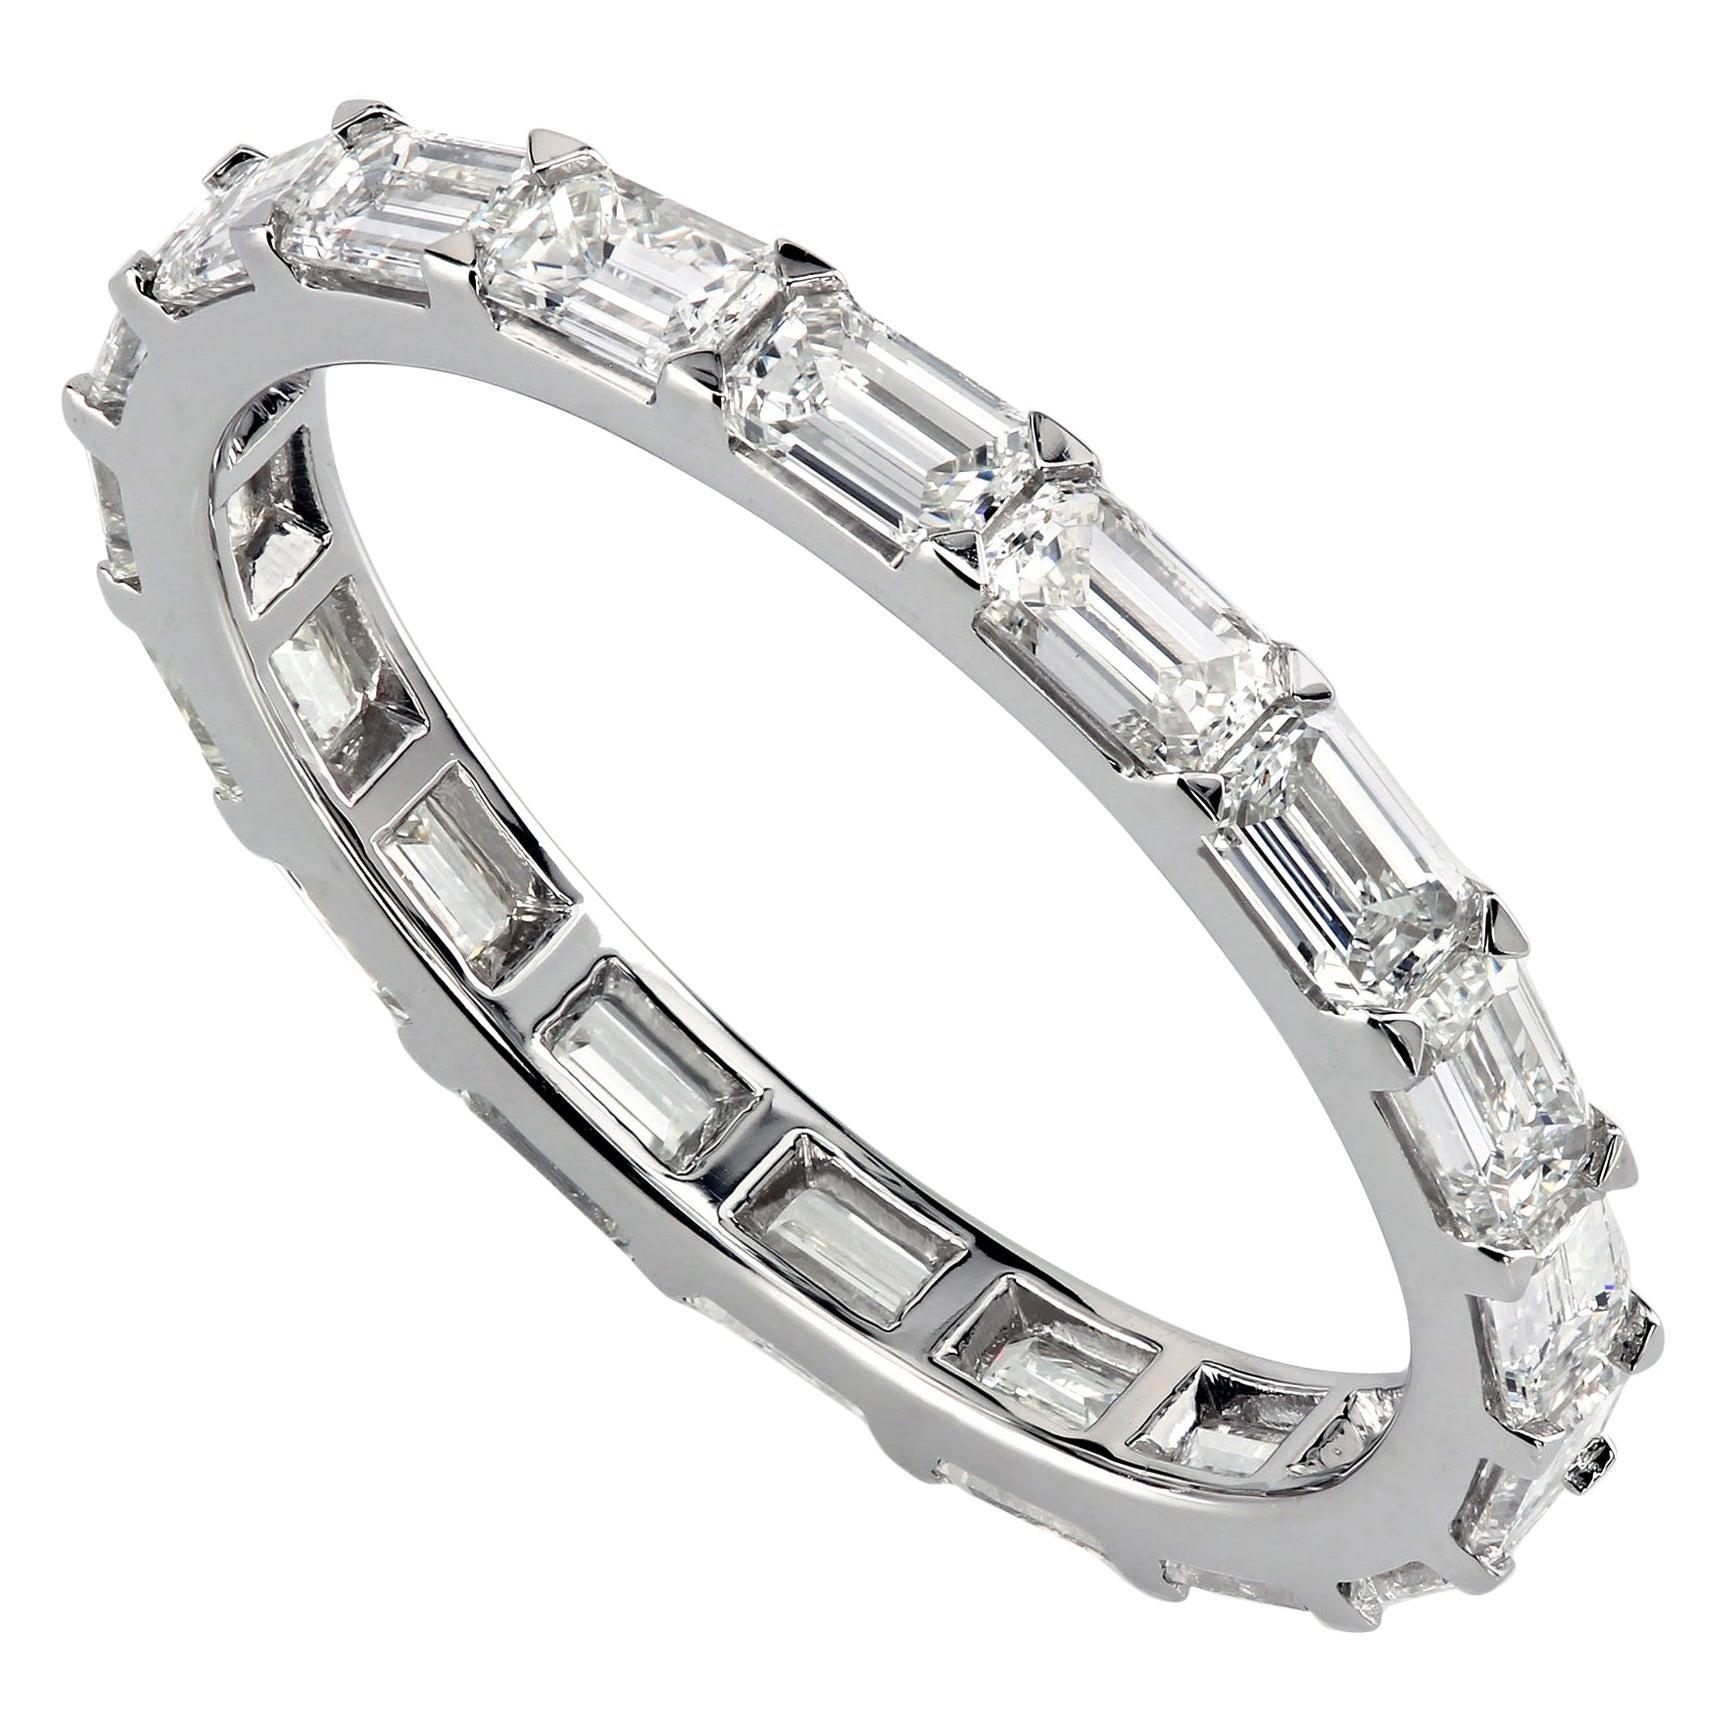 Leon Mege Eternity Diamond Band East-West Set Emerald Cut Diamonds in Platinum